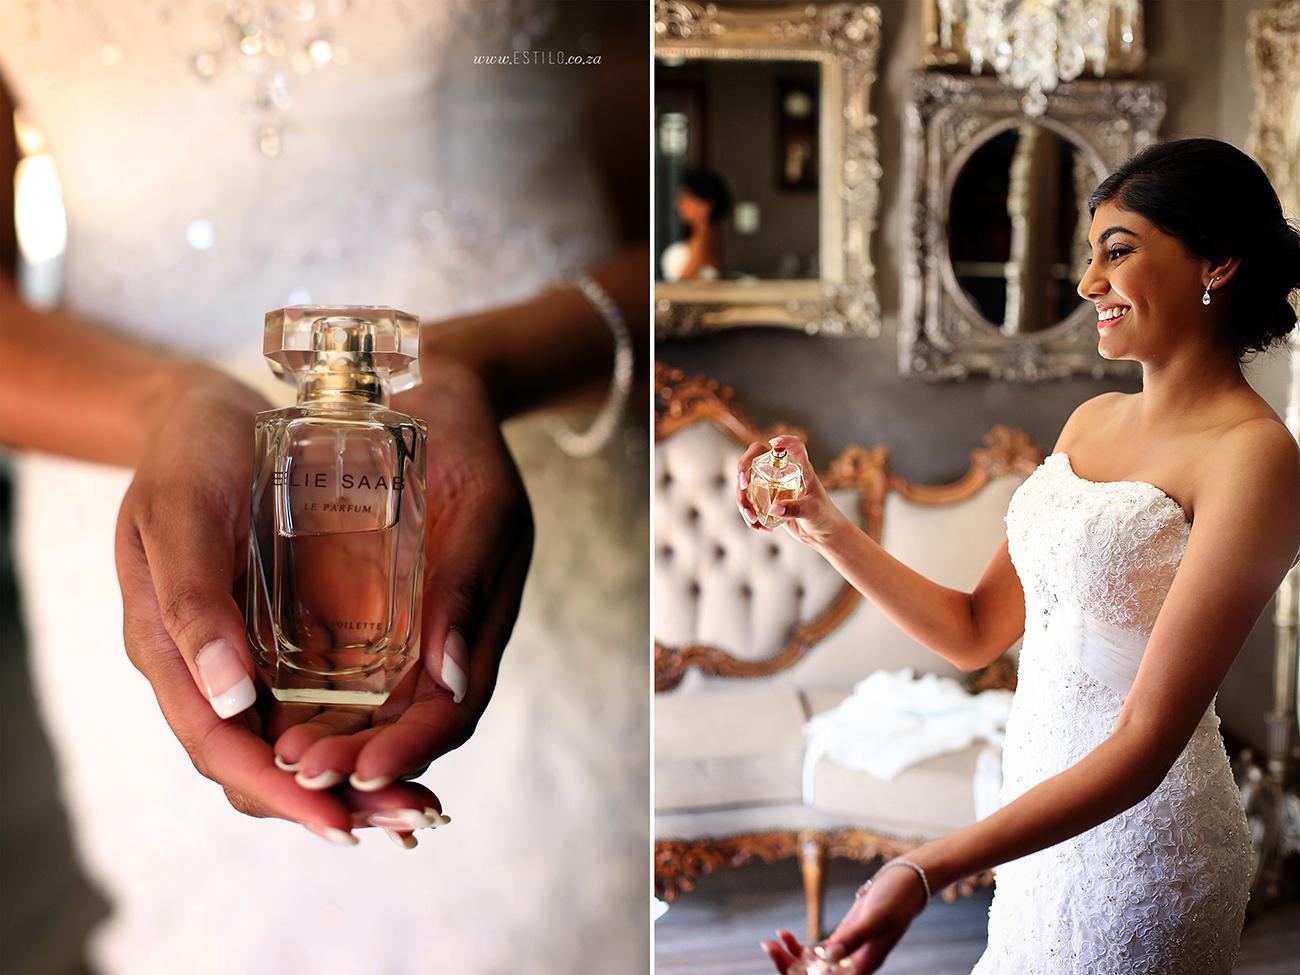 memoire-wedding-photograpgers-weddings-at-memoire-muldersdrift-best-wedding-photographers-gauteng-best-wedding-photographers-south-africa_0008.jpg